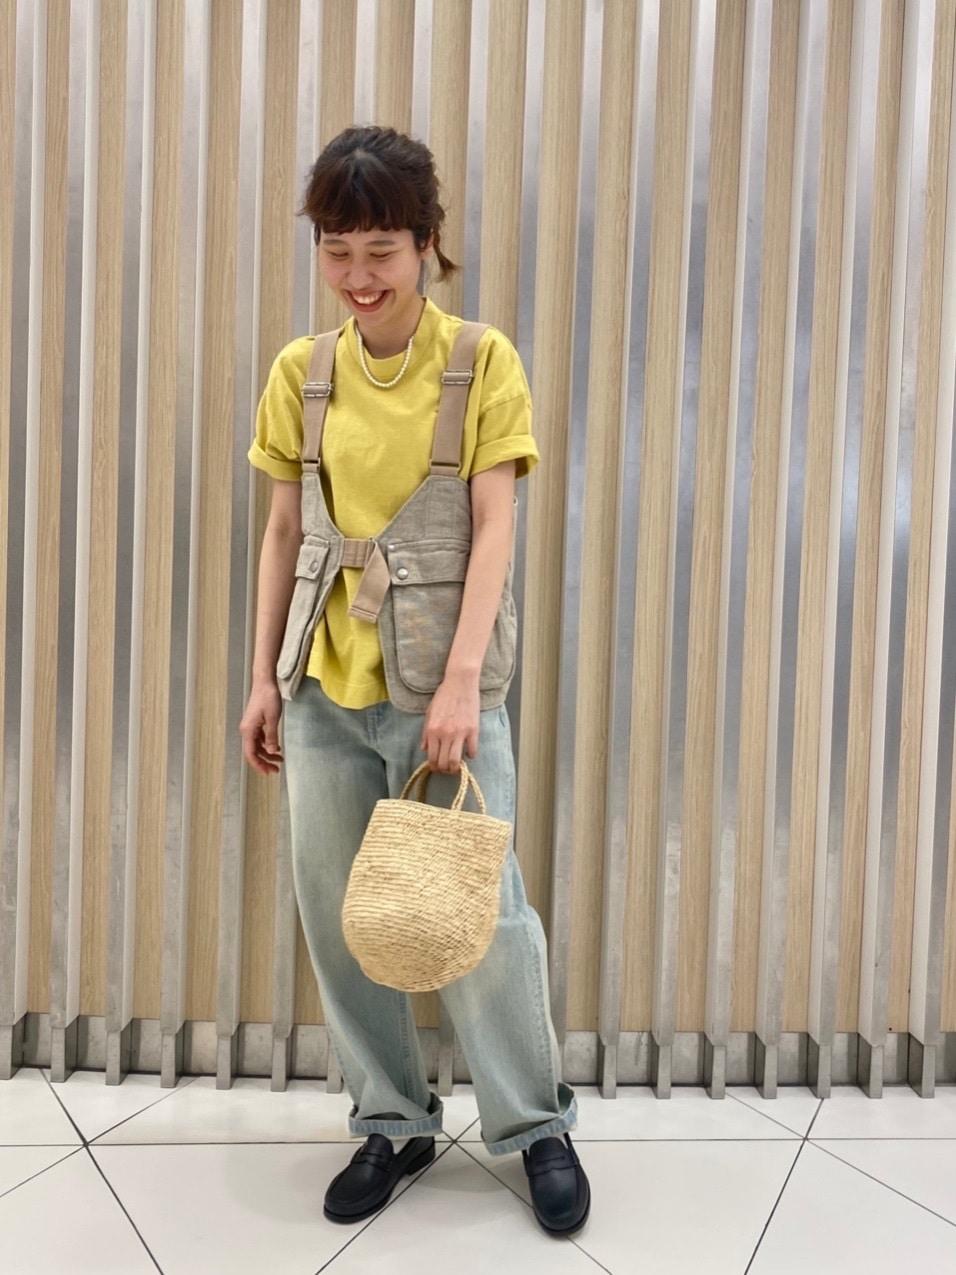 CHILD WOMAN , PAR ICI 東京スカイツリータウン・ソラマチ 2021.04.28